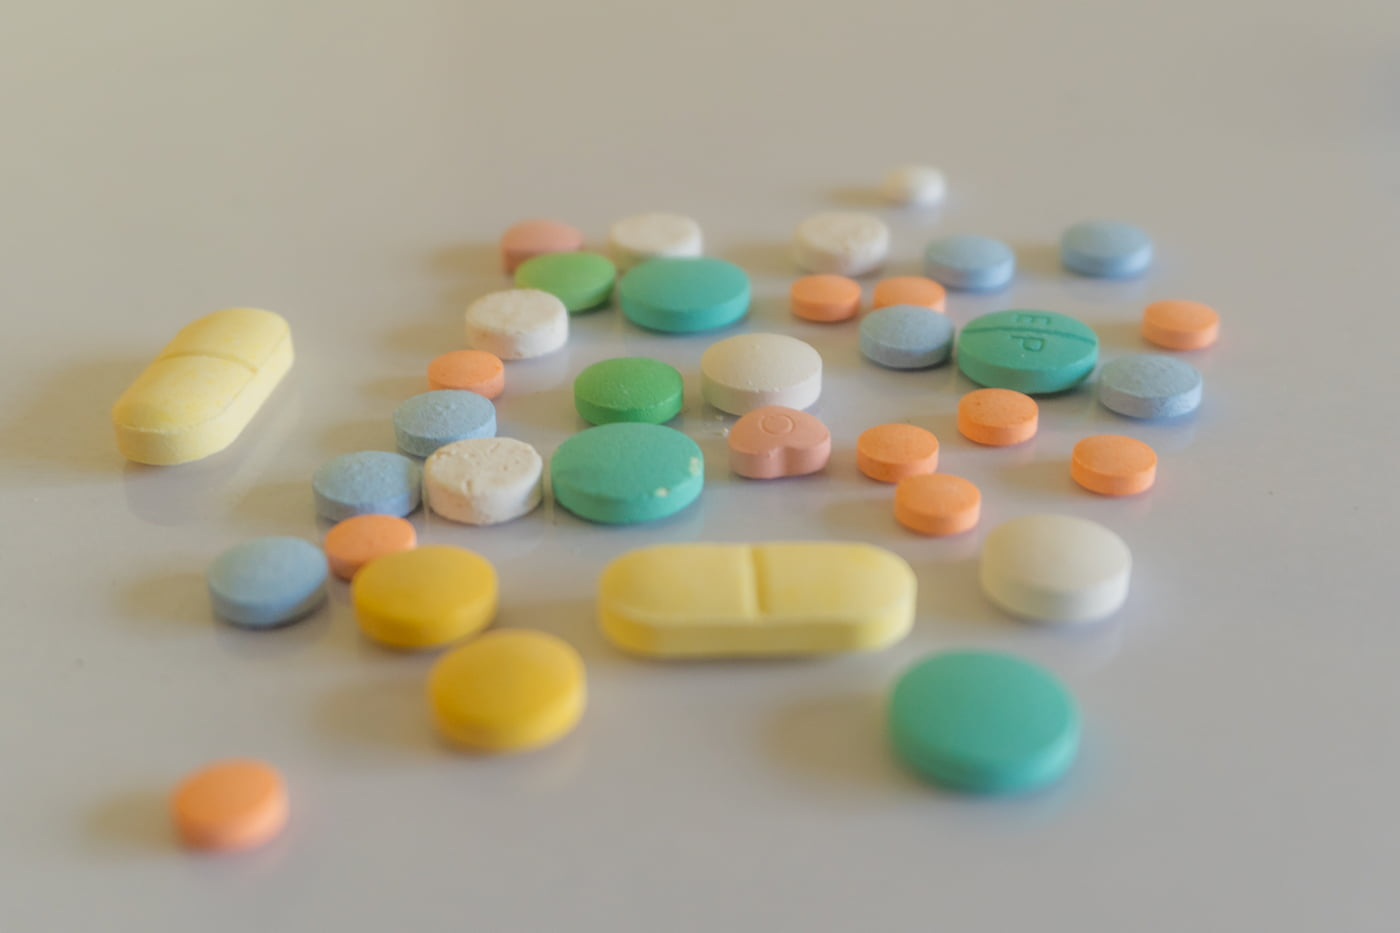 multiple prescriptions